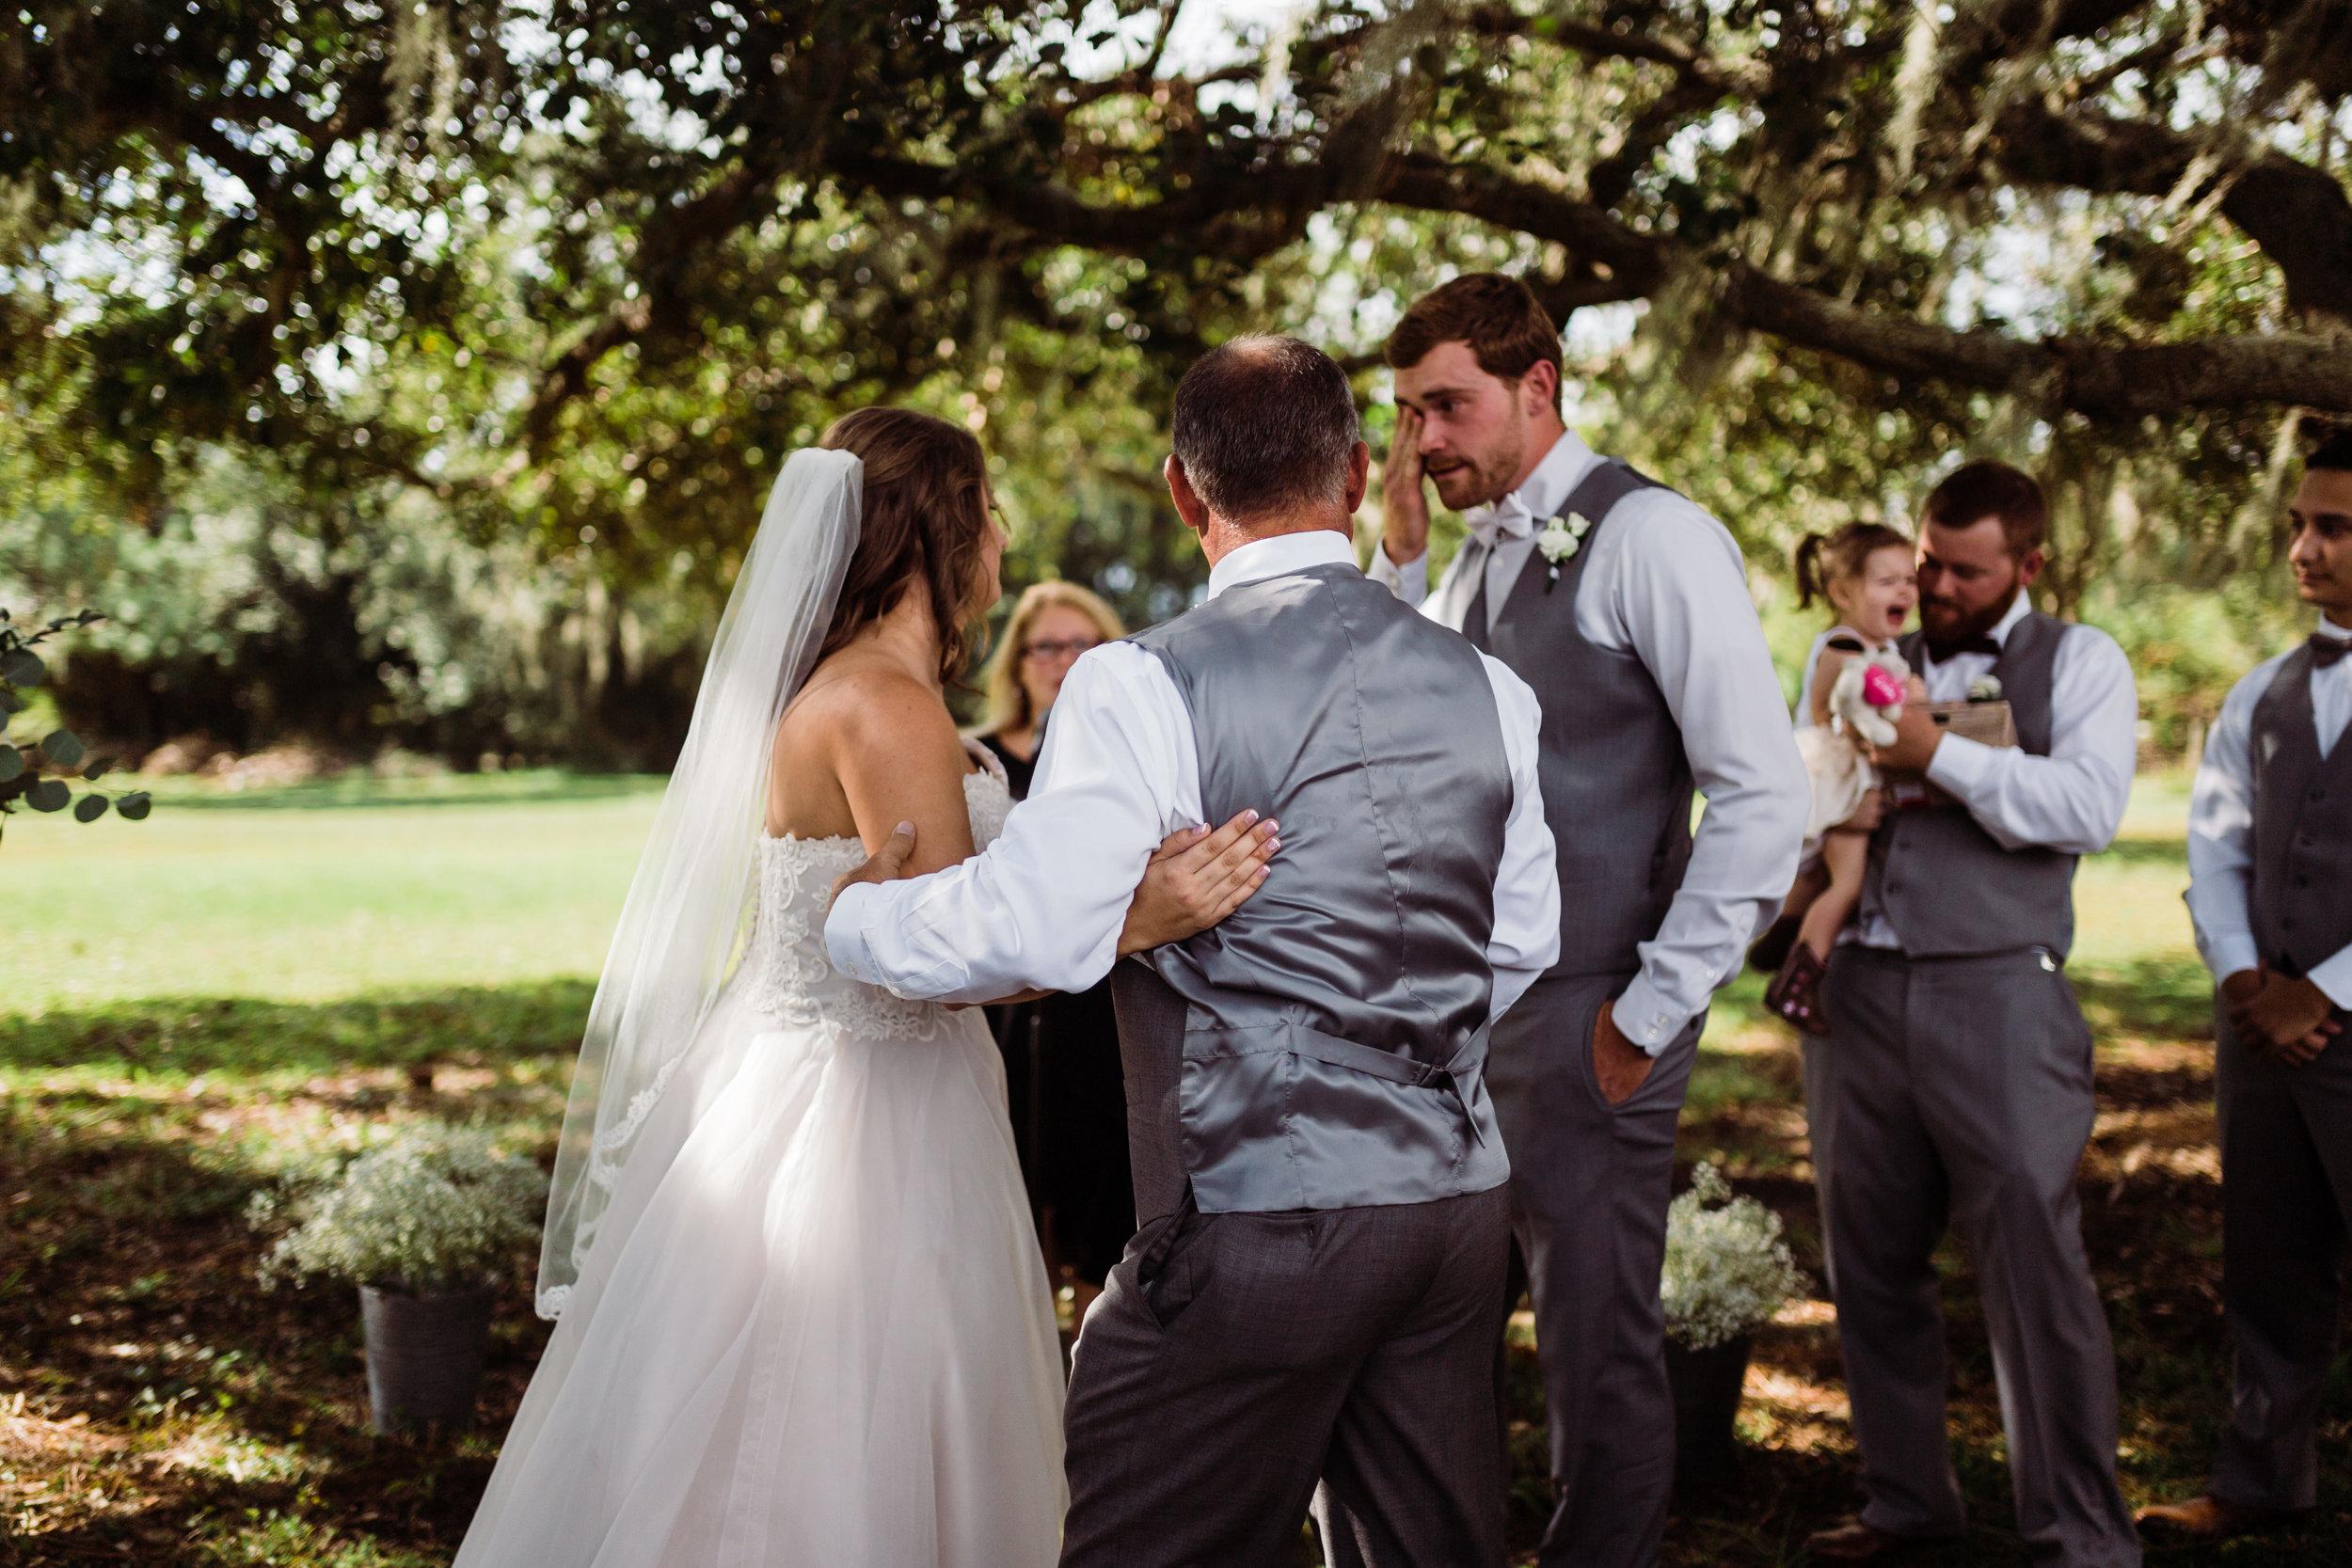 2017.10.14 Samantha and Matthew Crabtree Sarasota Wedding (142 of 708).jpg